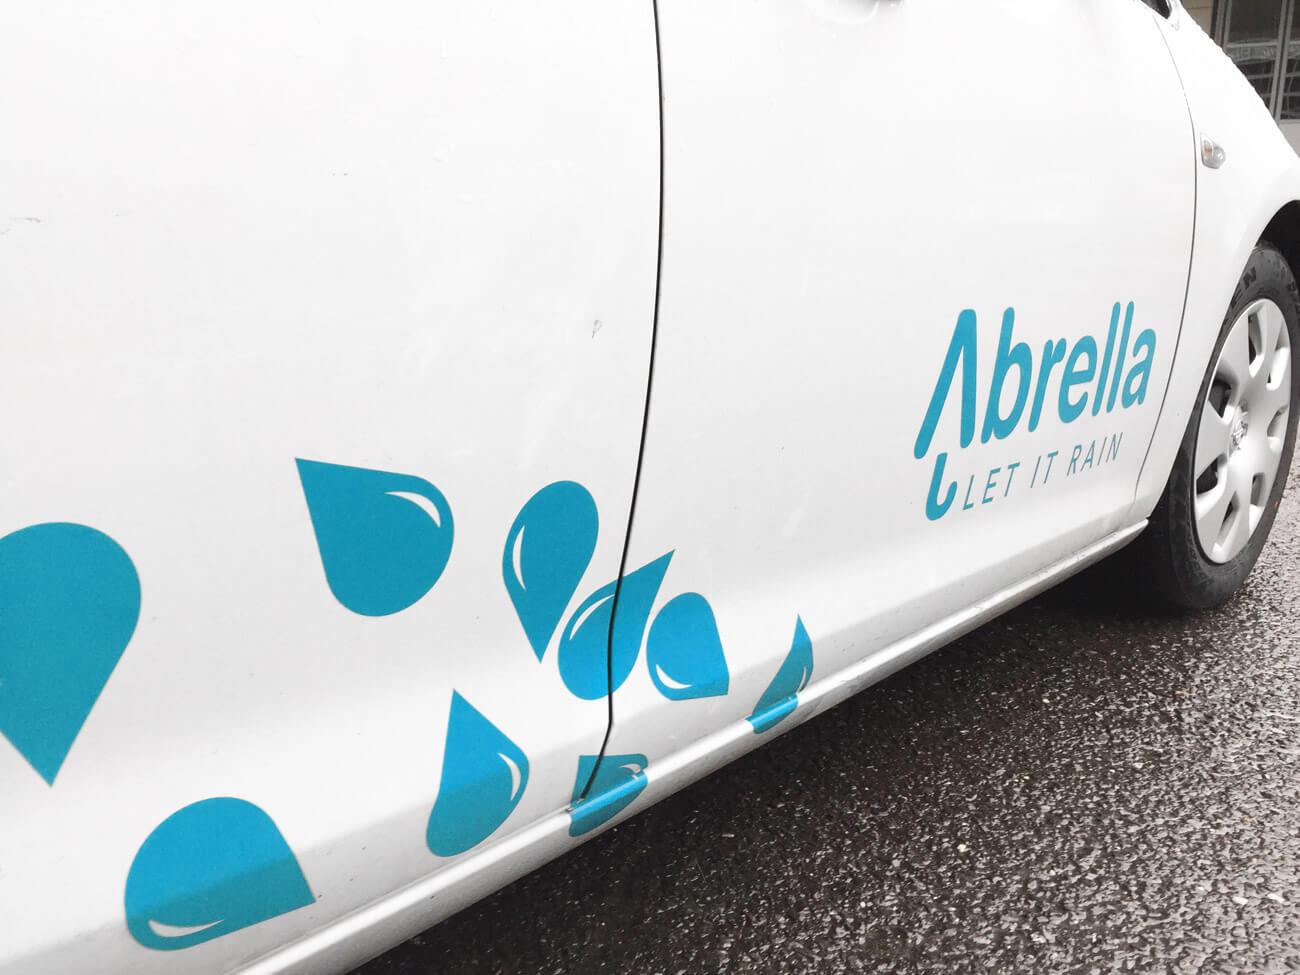 Abrella byparaplyer, paraplyer, bil